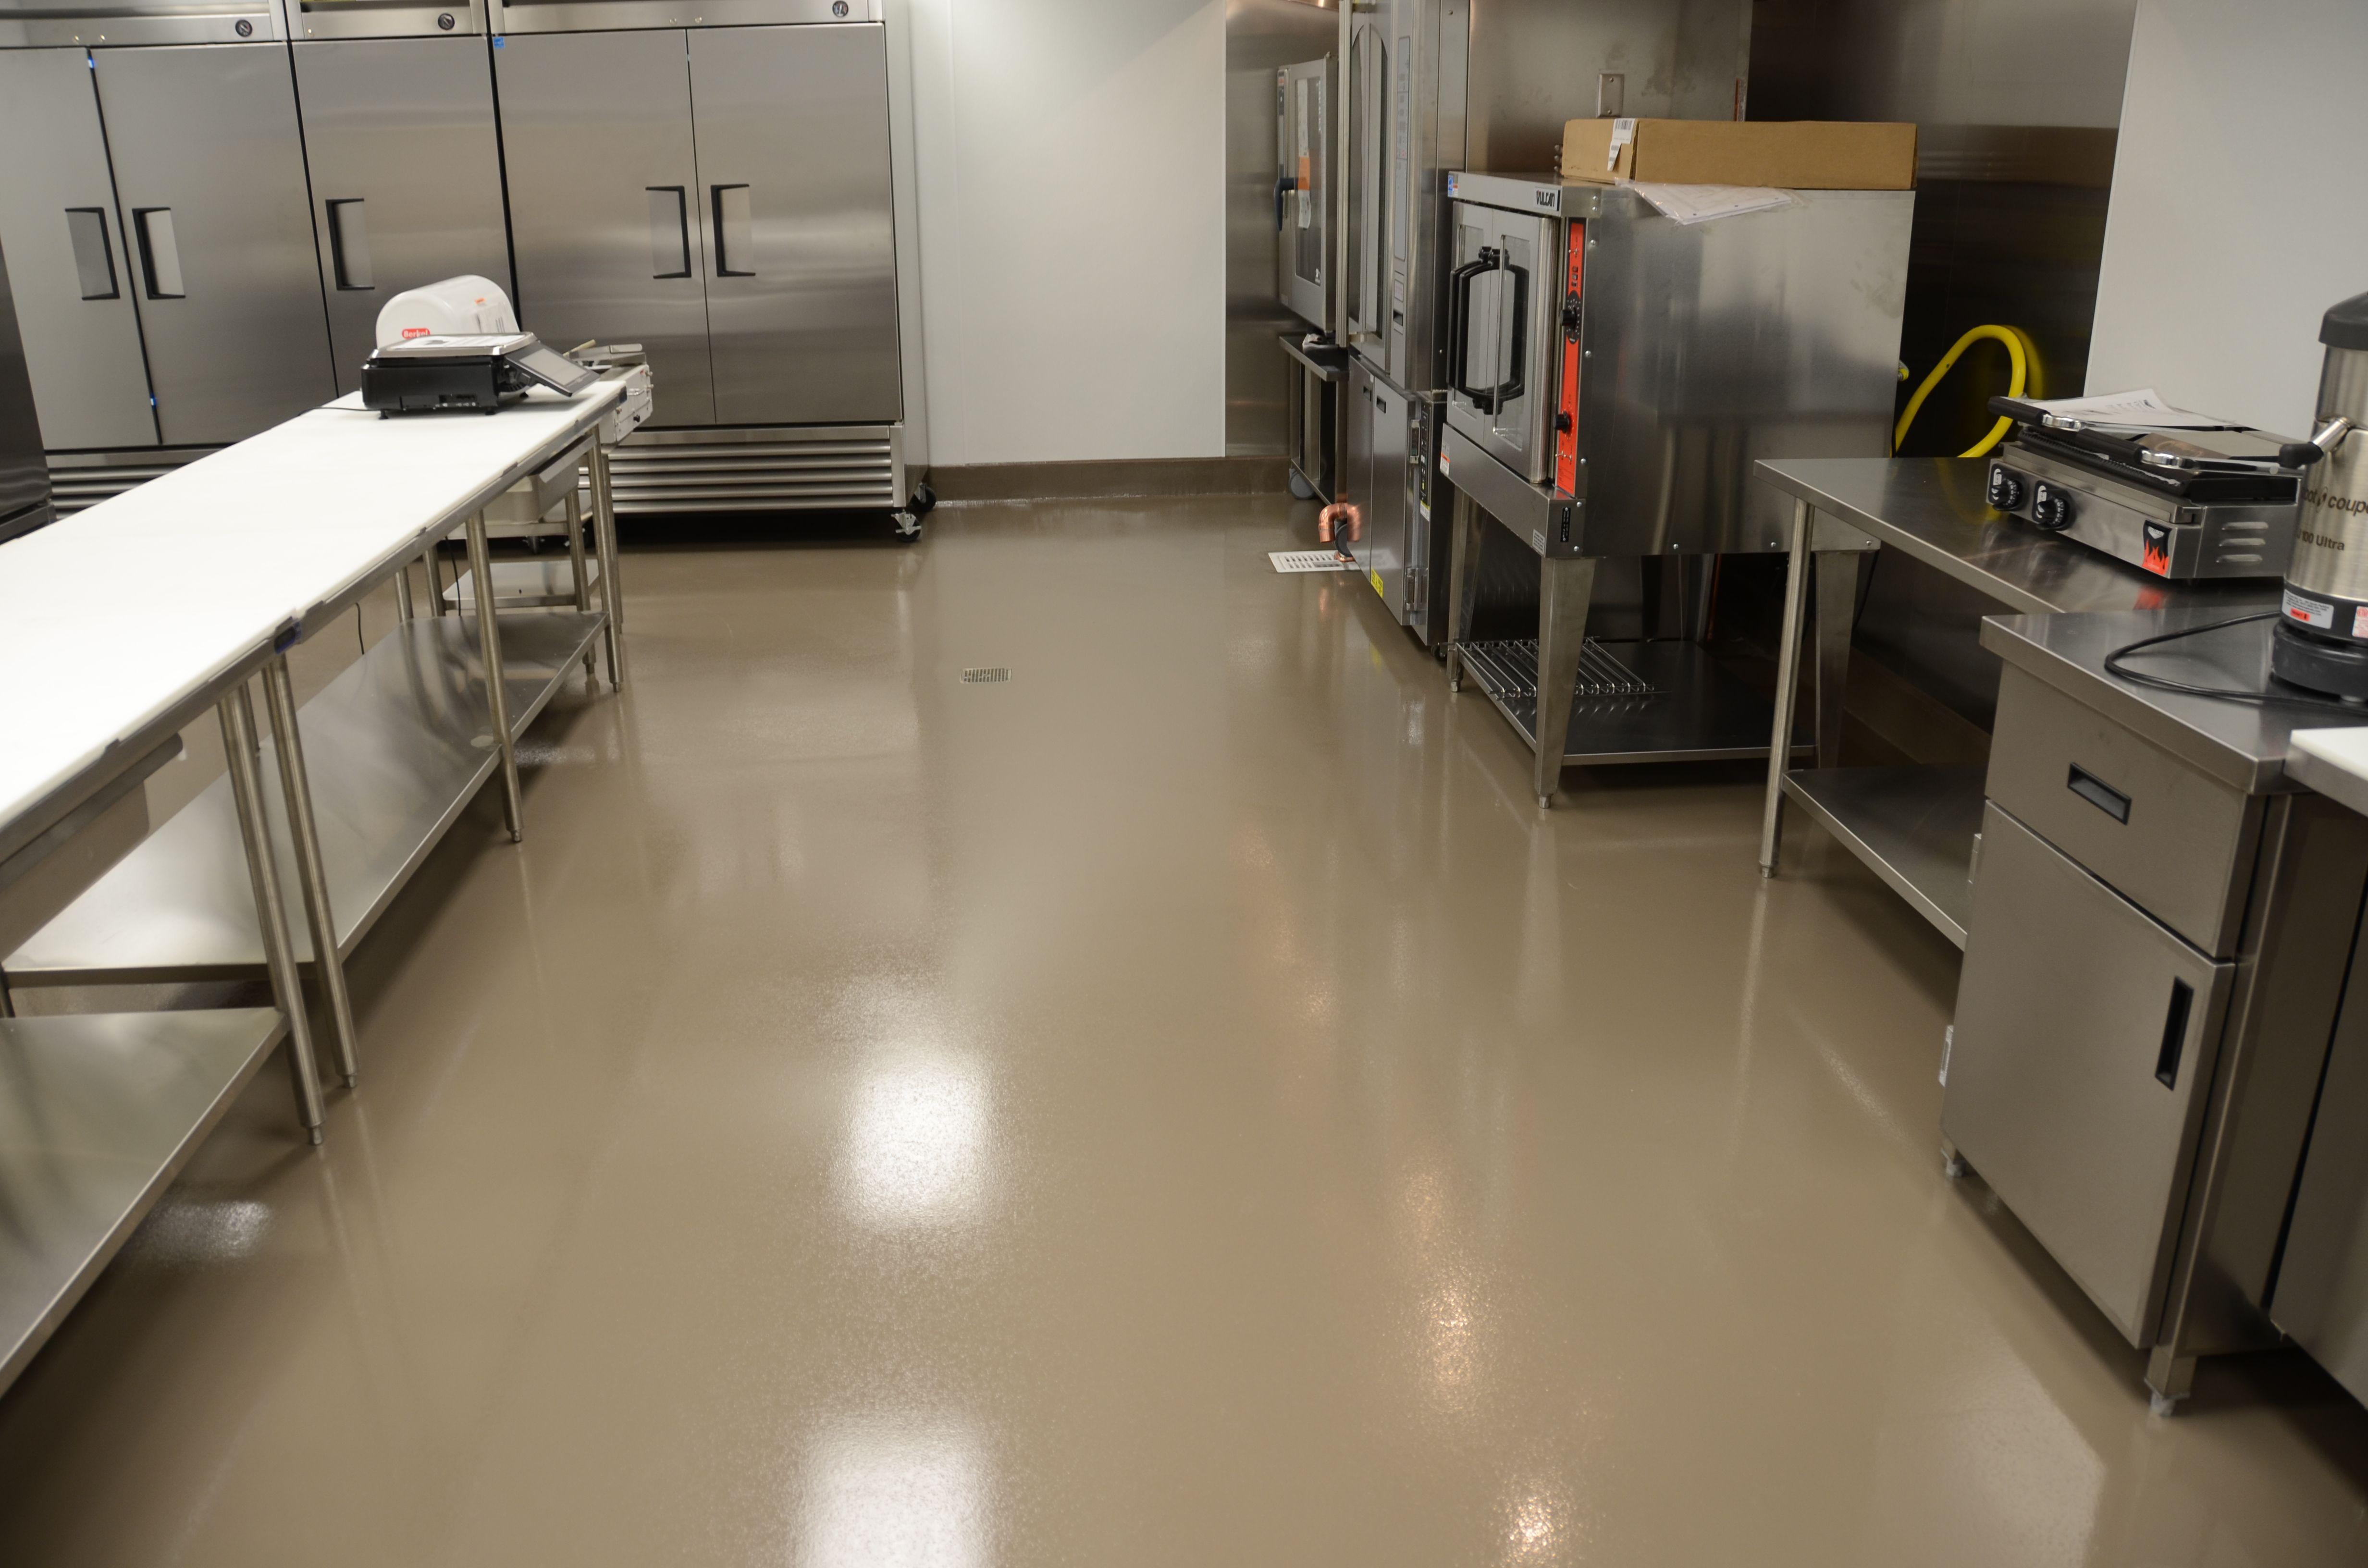 Best Flooring For Kitchen With Concrete Slab Enjoyable Adventure